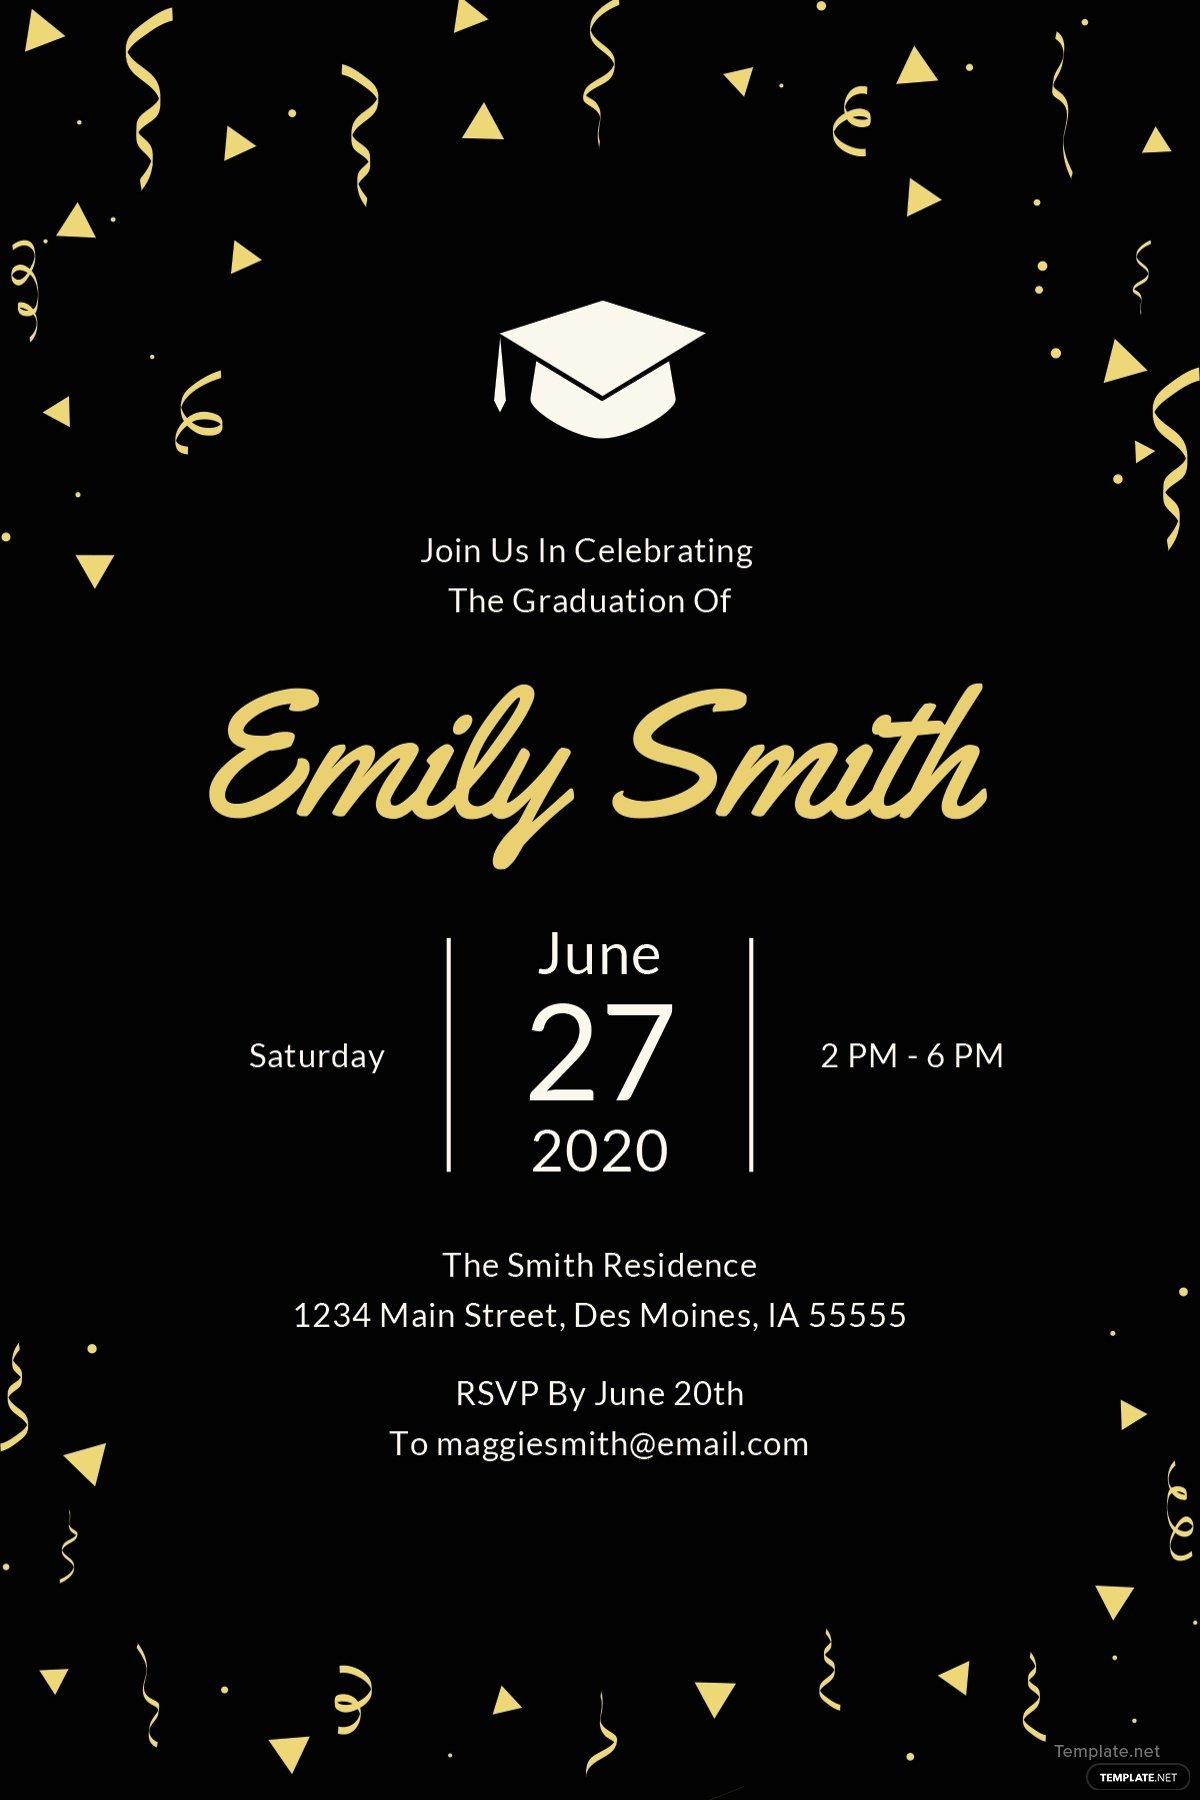 Graduation Dinner Invitation Template Best Of Free Graduation Invitation Template In Microsoft Word